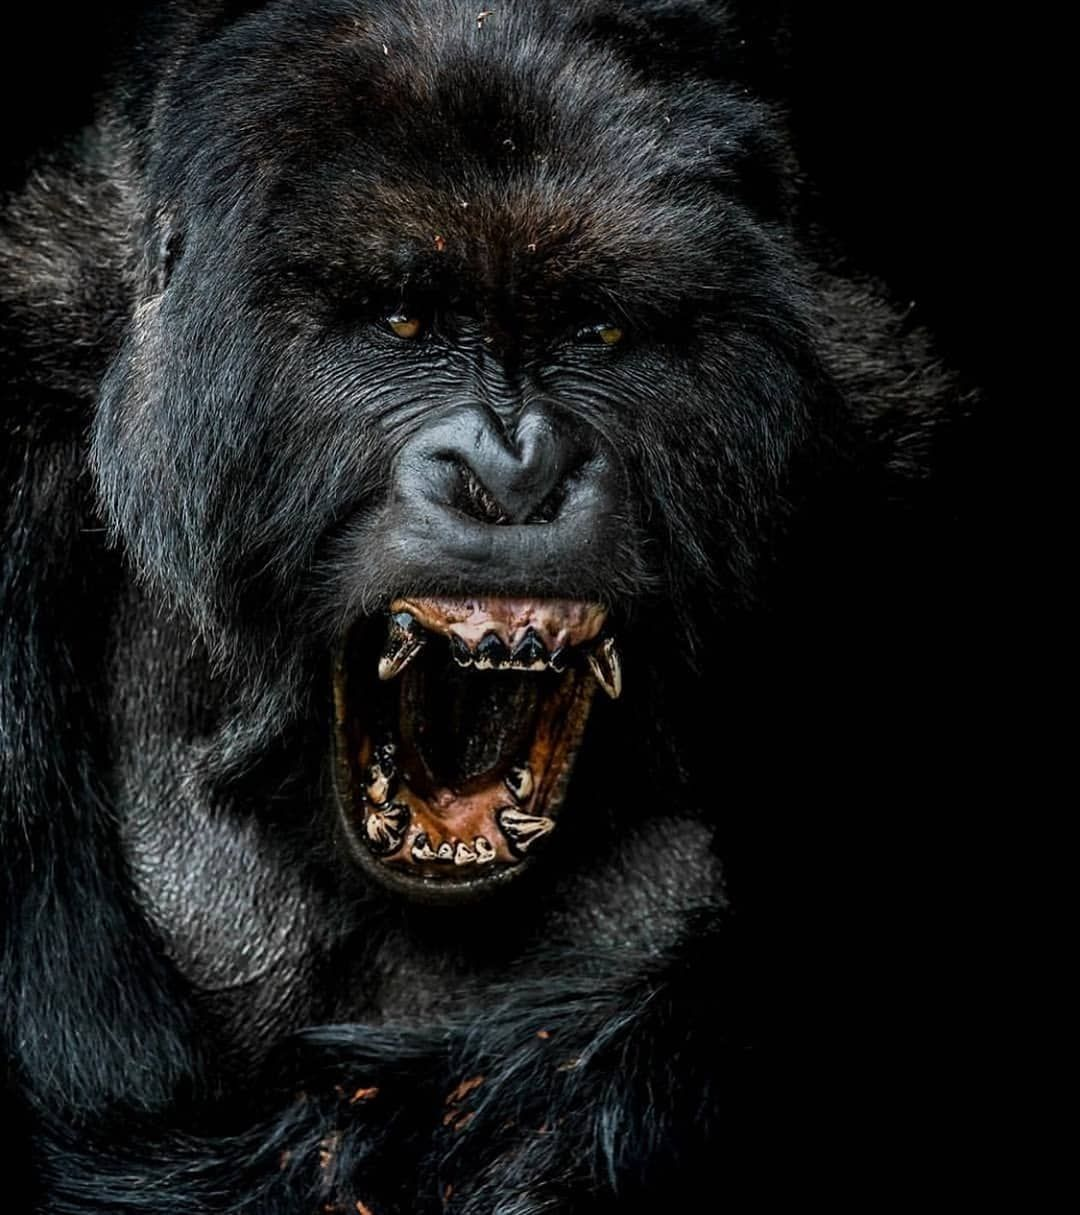 A Gorrila screaming. Wildlife animals, Volcano national